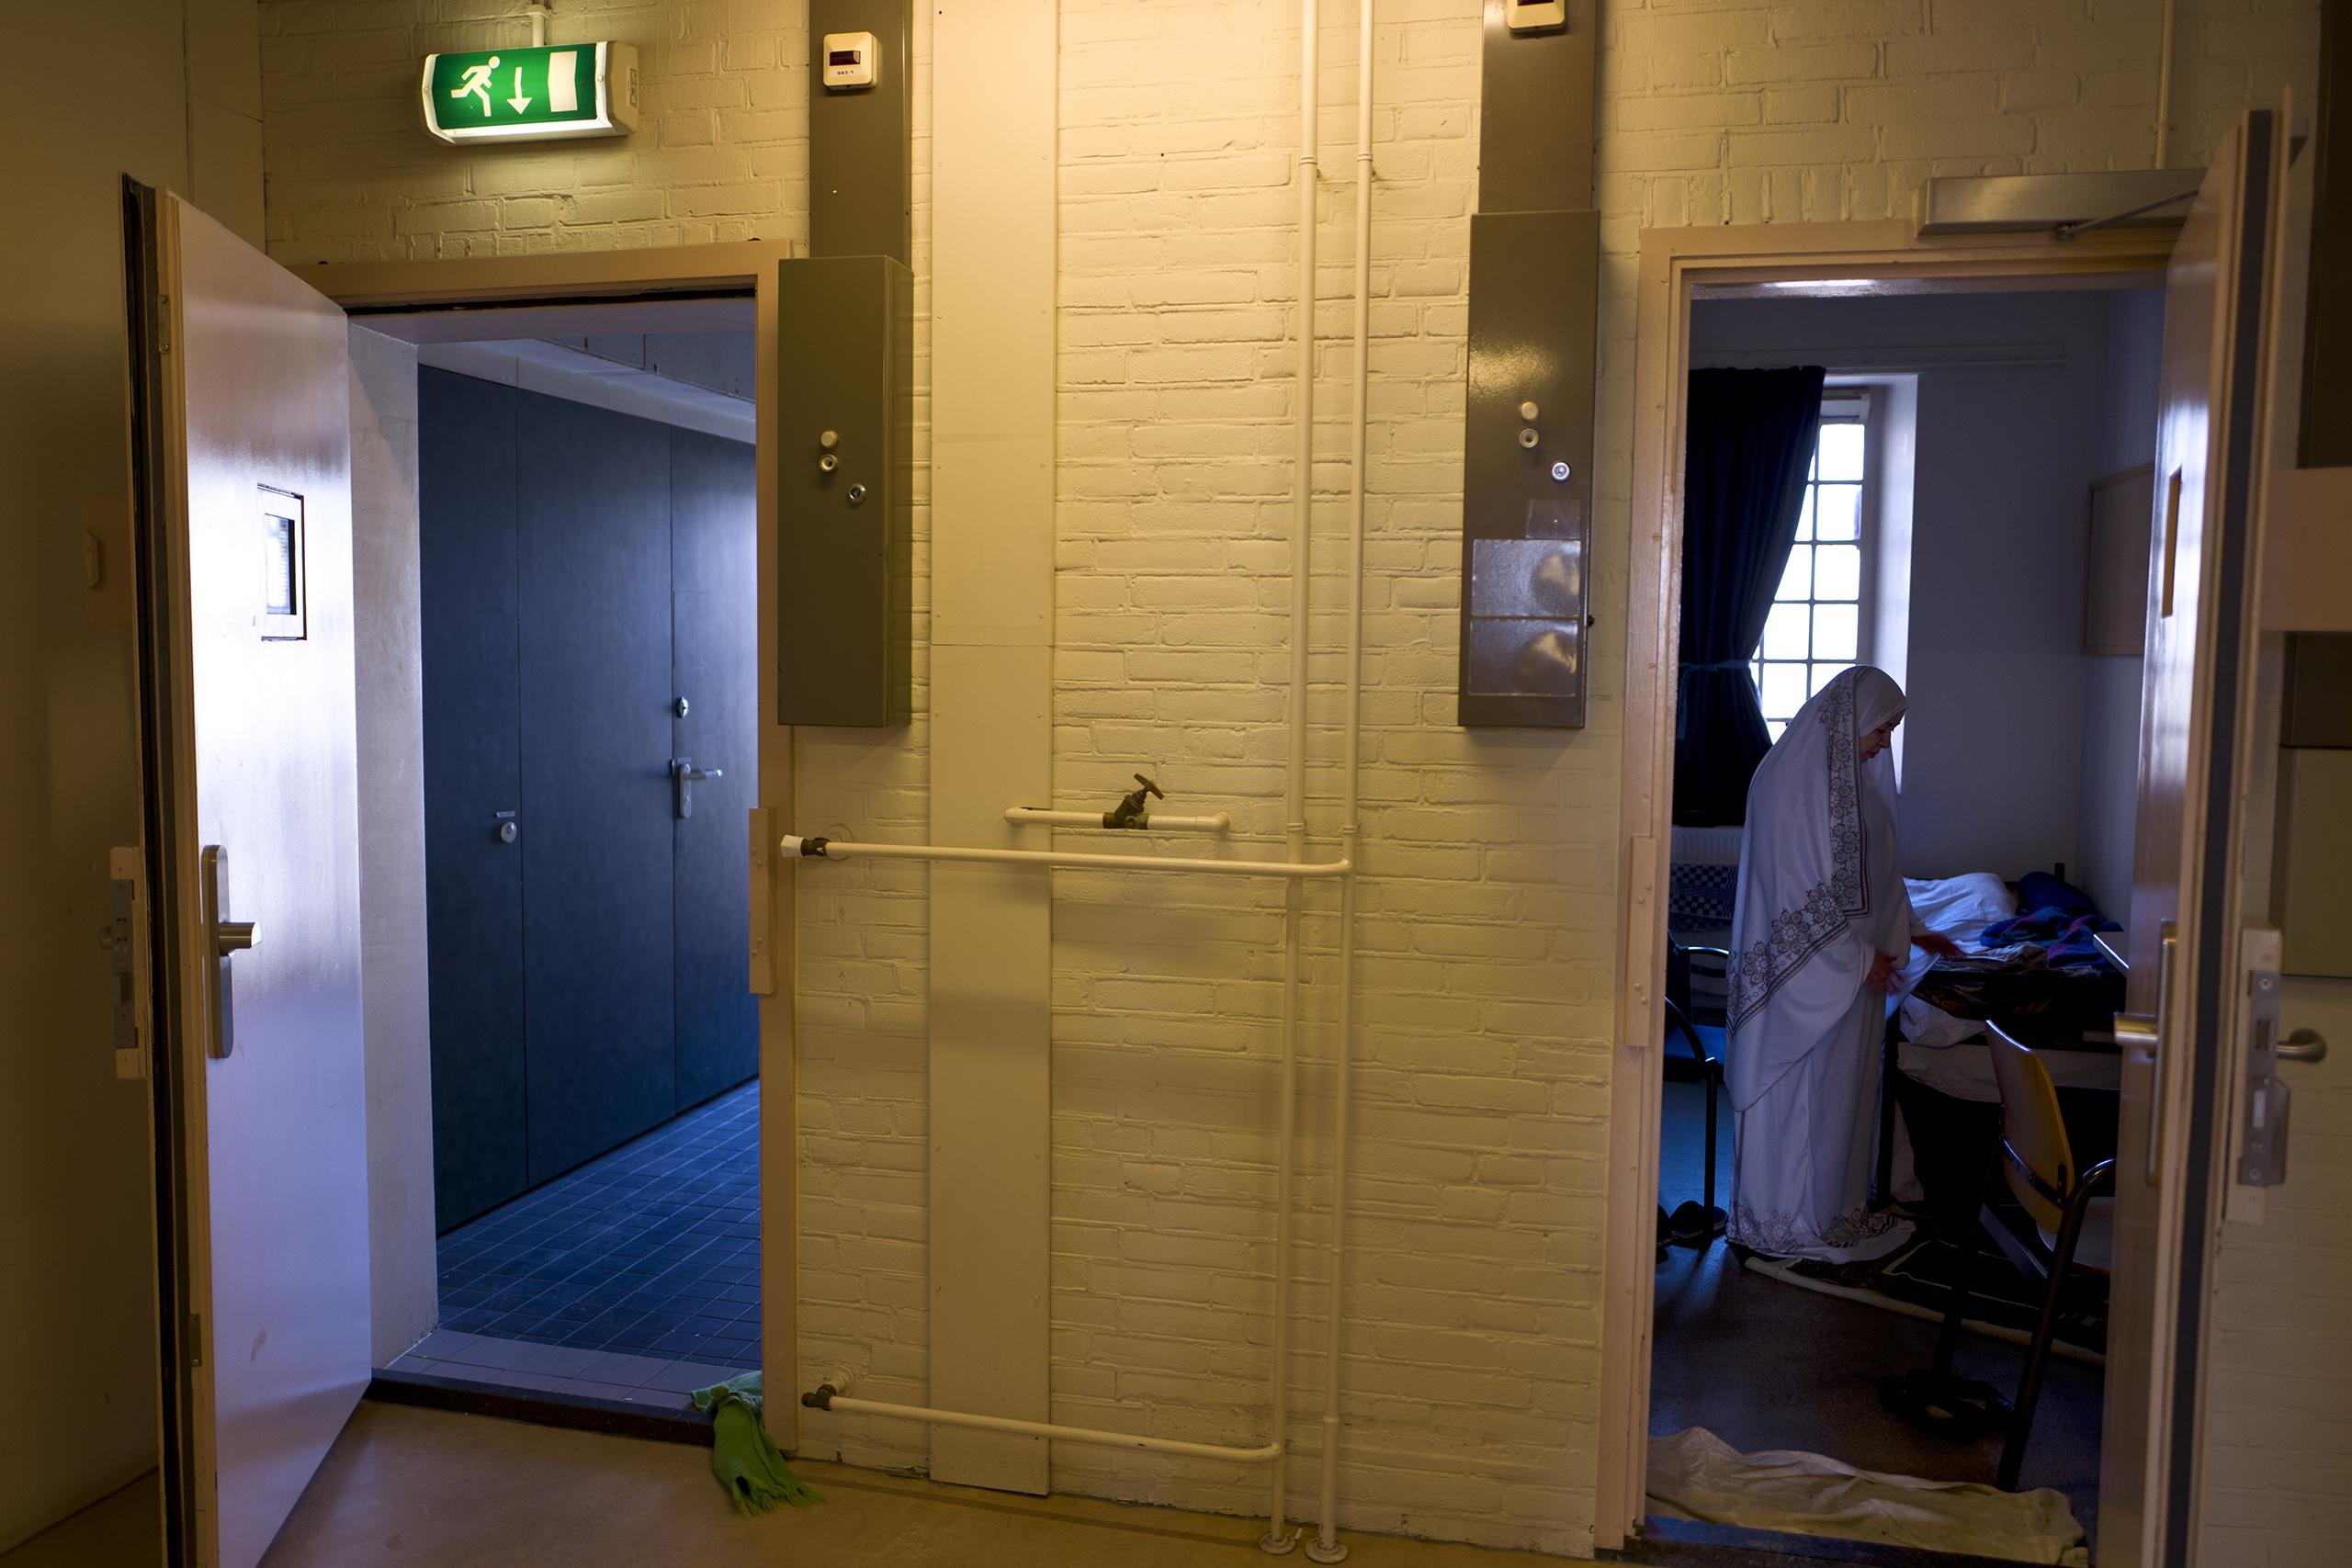 Iraqi refugee Fatima Hussein, 65, prays inside her room at the former prison of De Koepel in Haarlem, Netherlands, April 20, 2016.